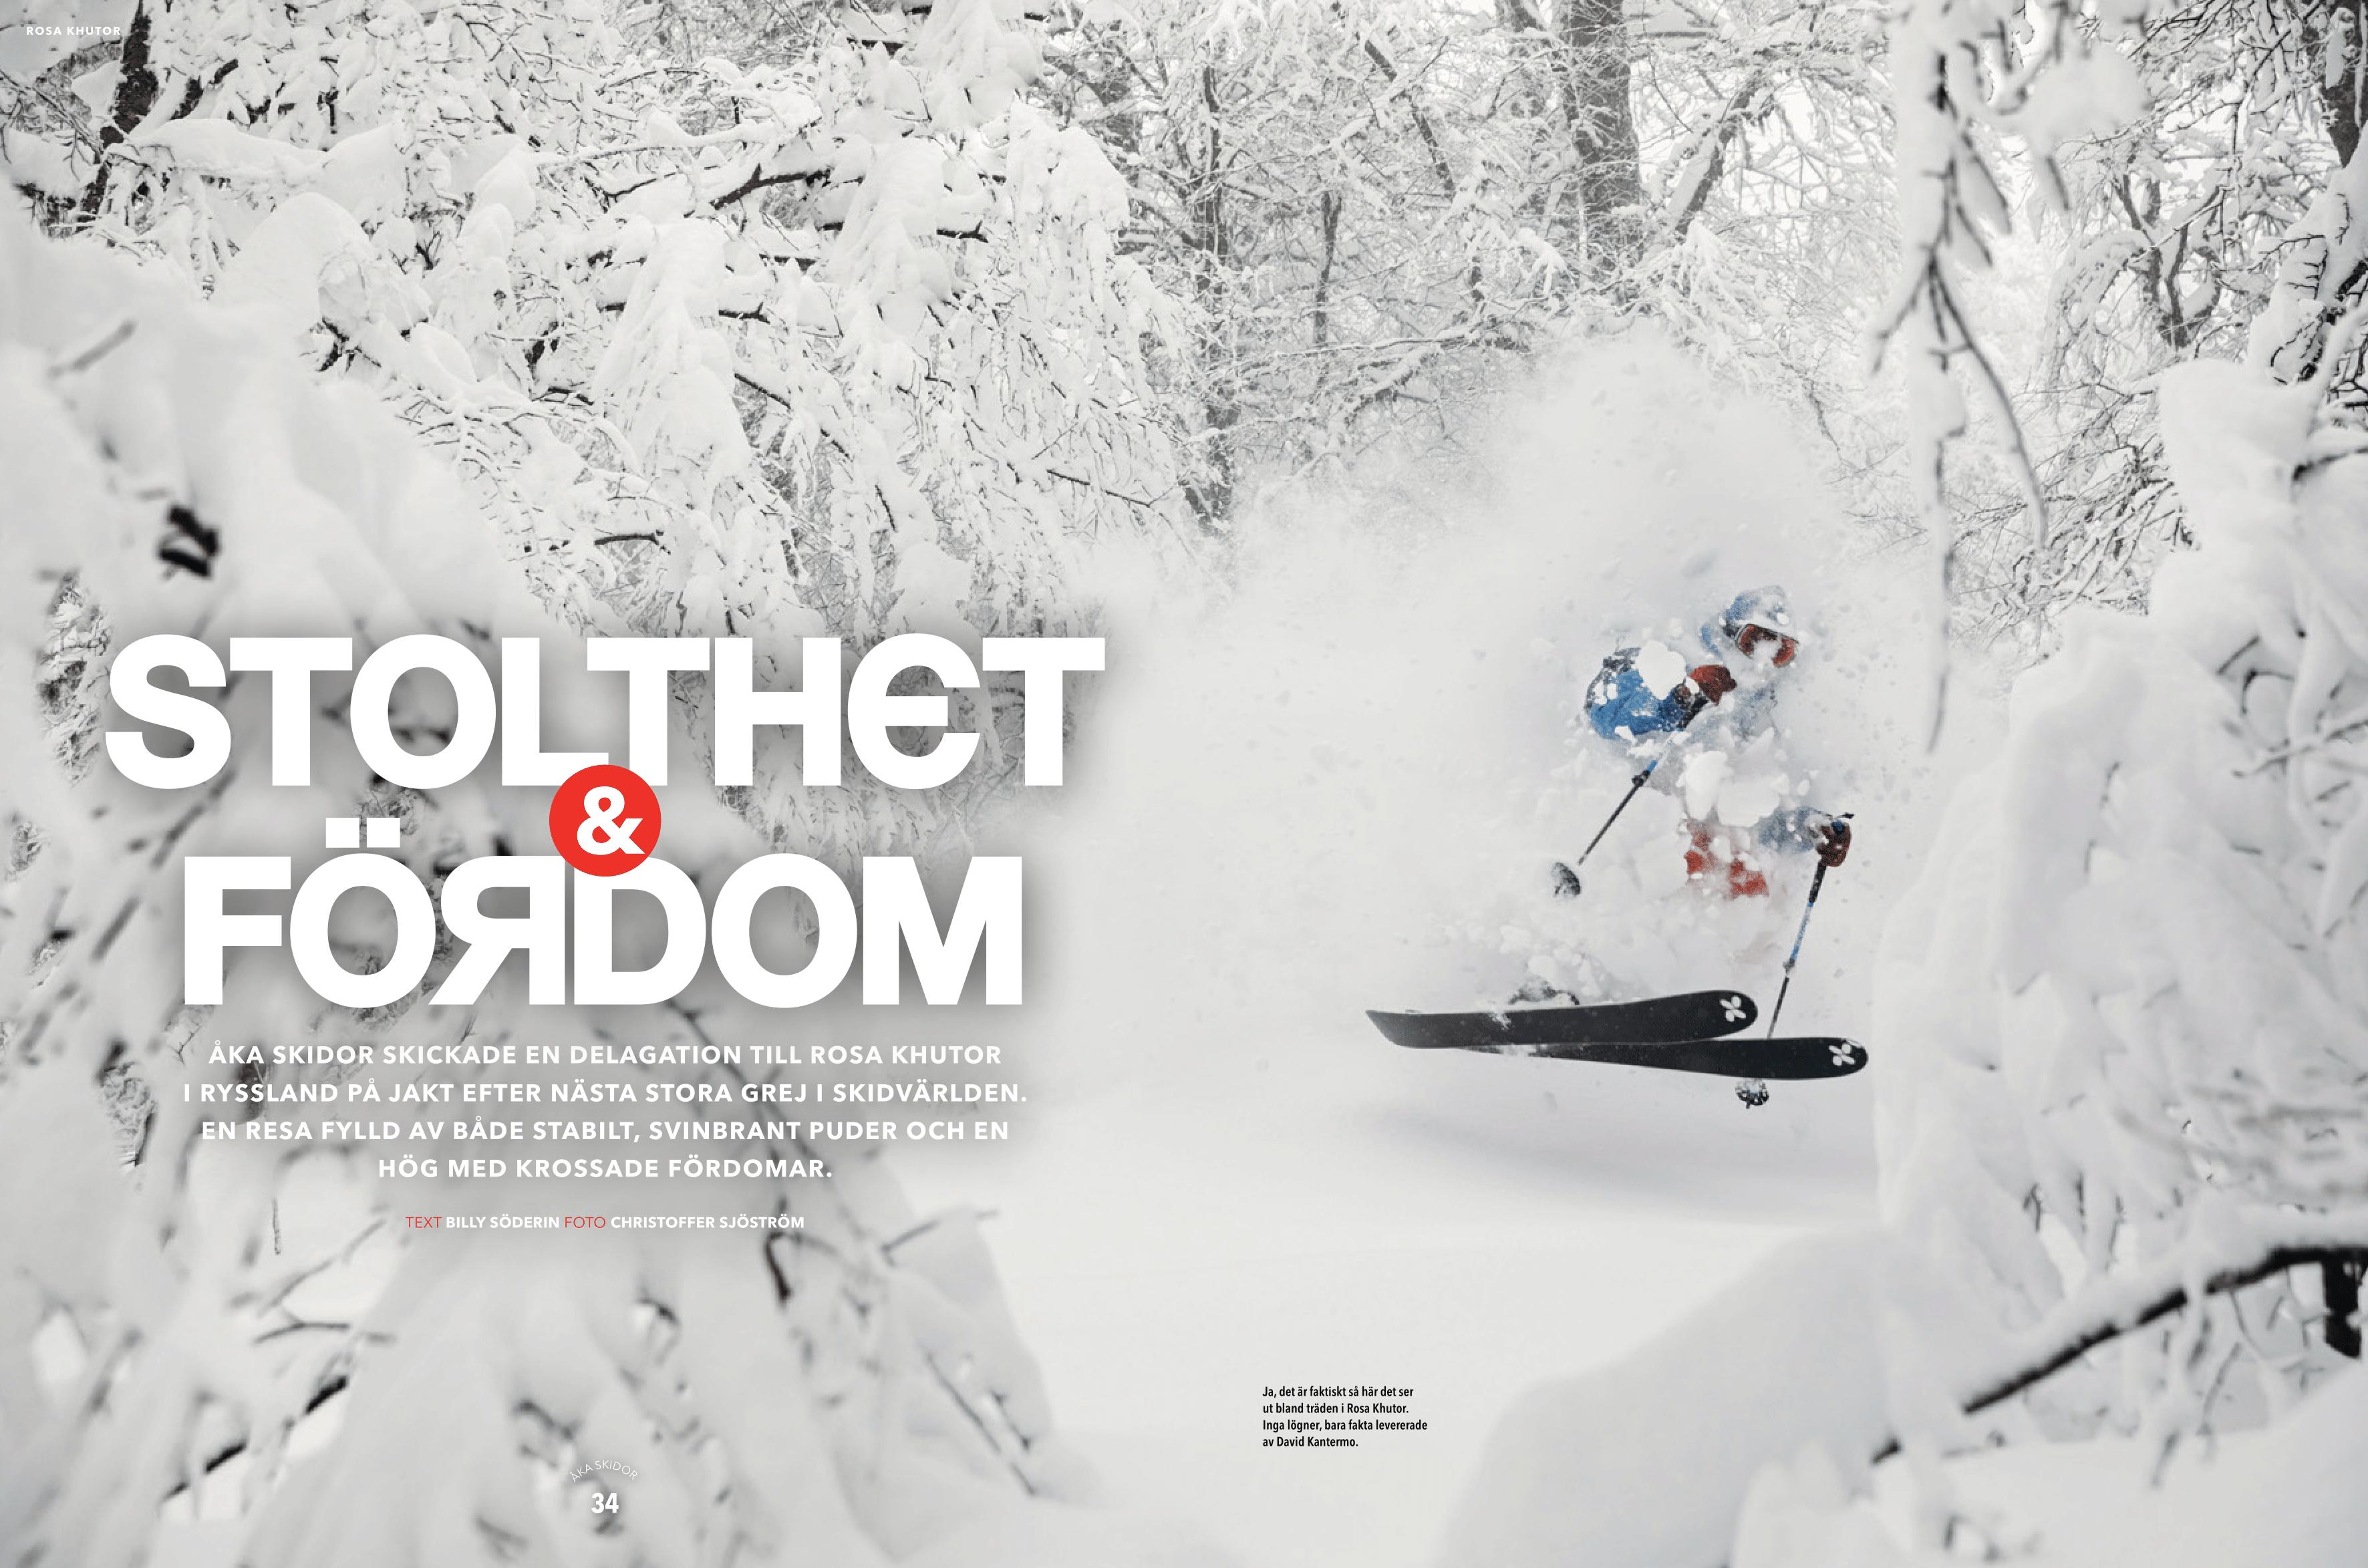 Åka Skidor Sochi article - front page